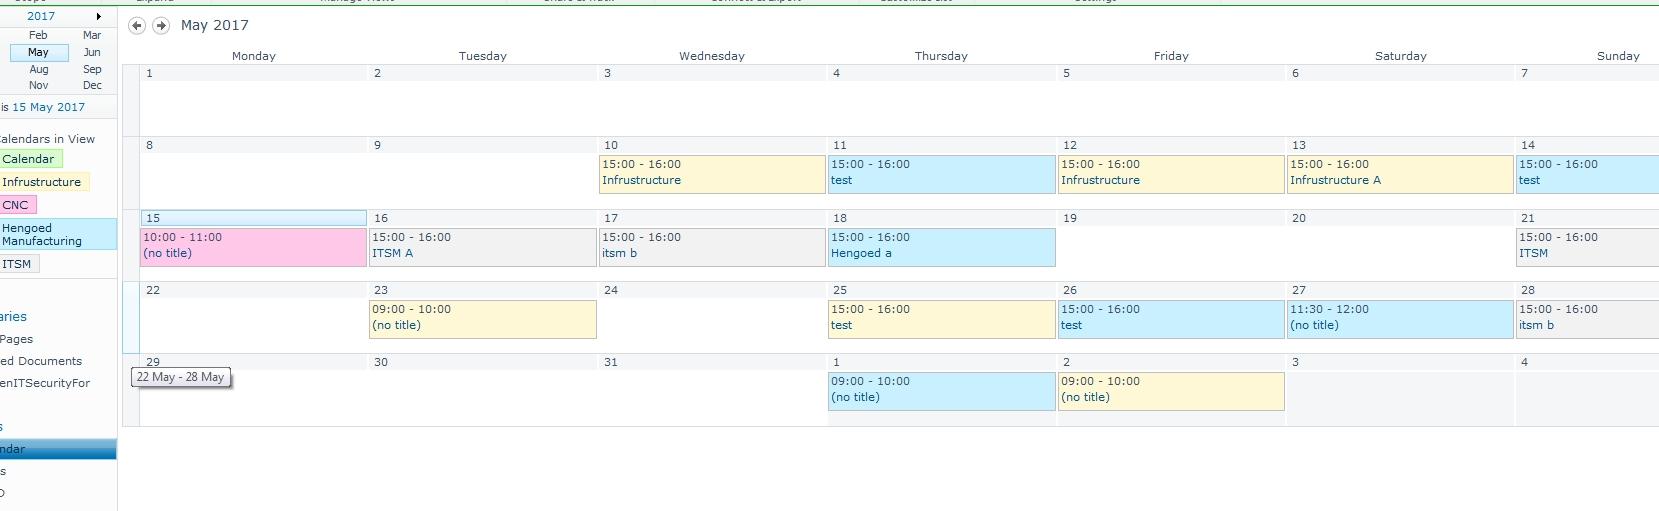 List - Making A Dropdown Choice Show Up In A Calendar View regarding Sharepoint 2013 Calendar Overlay Settings